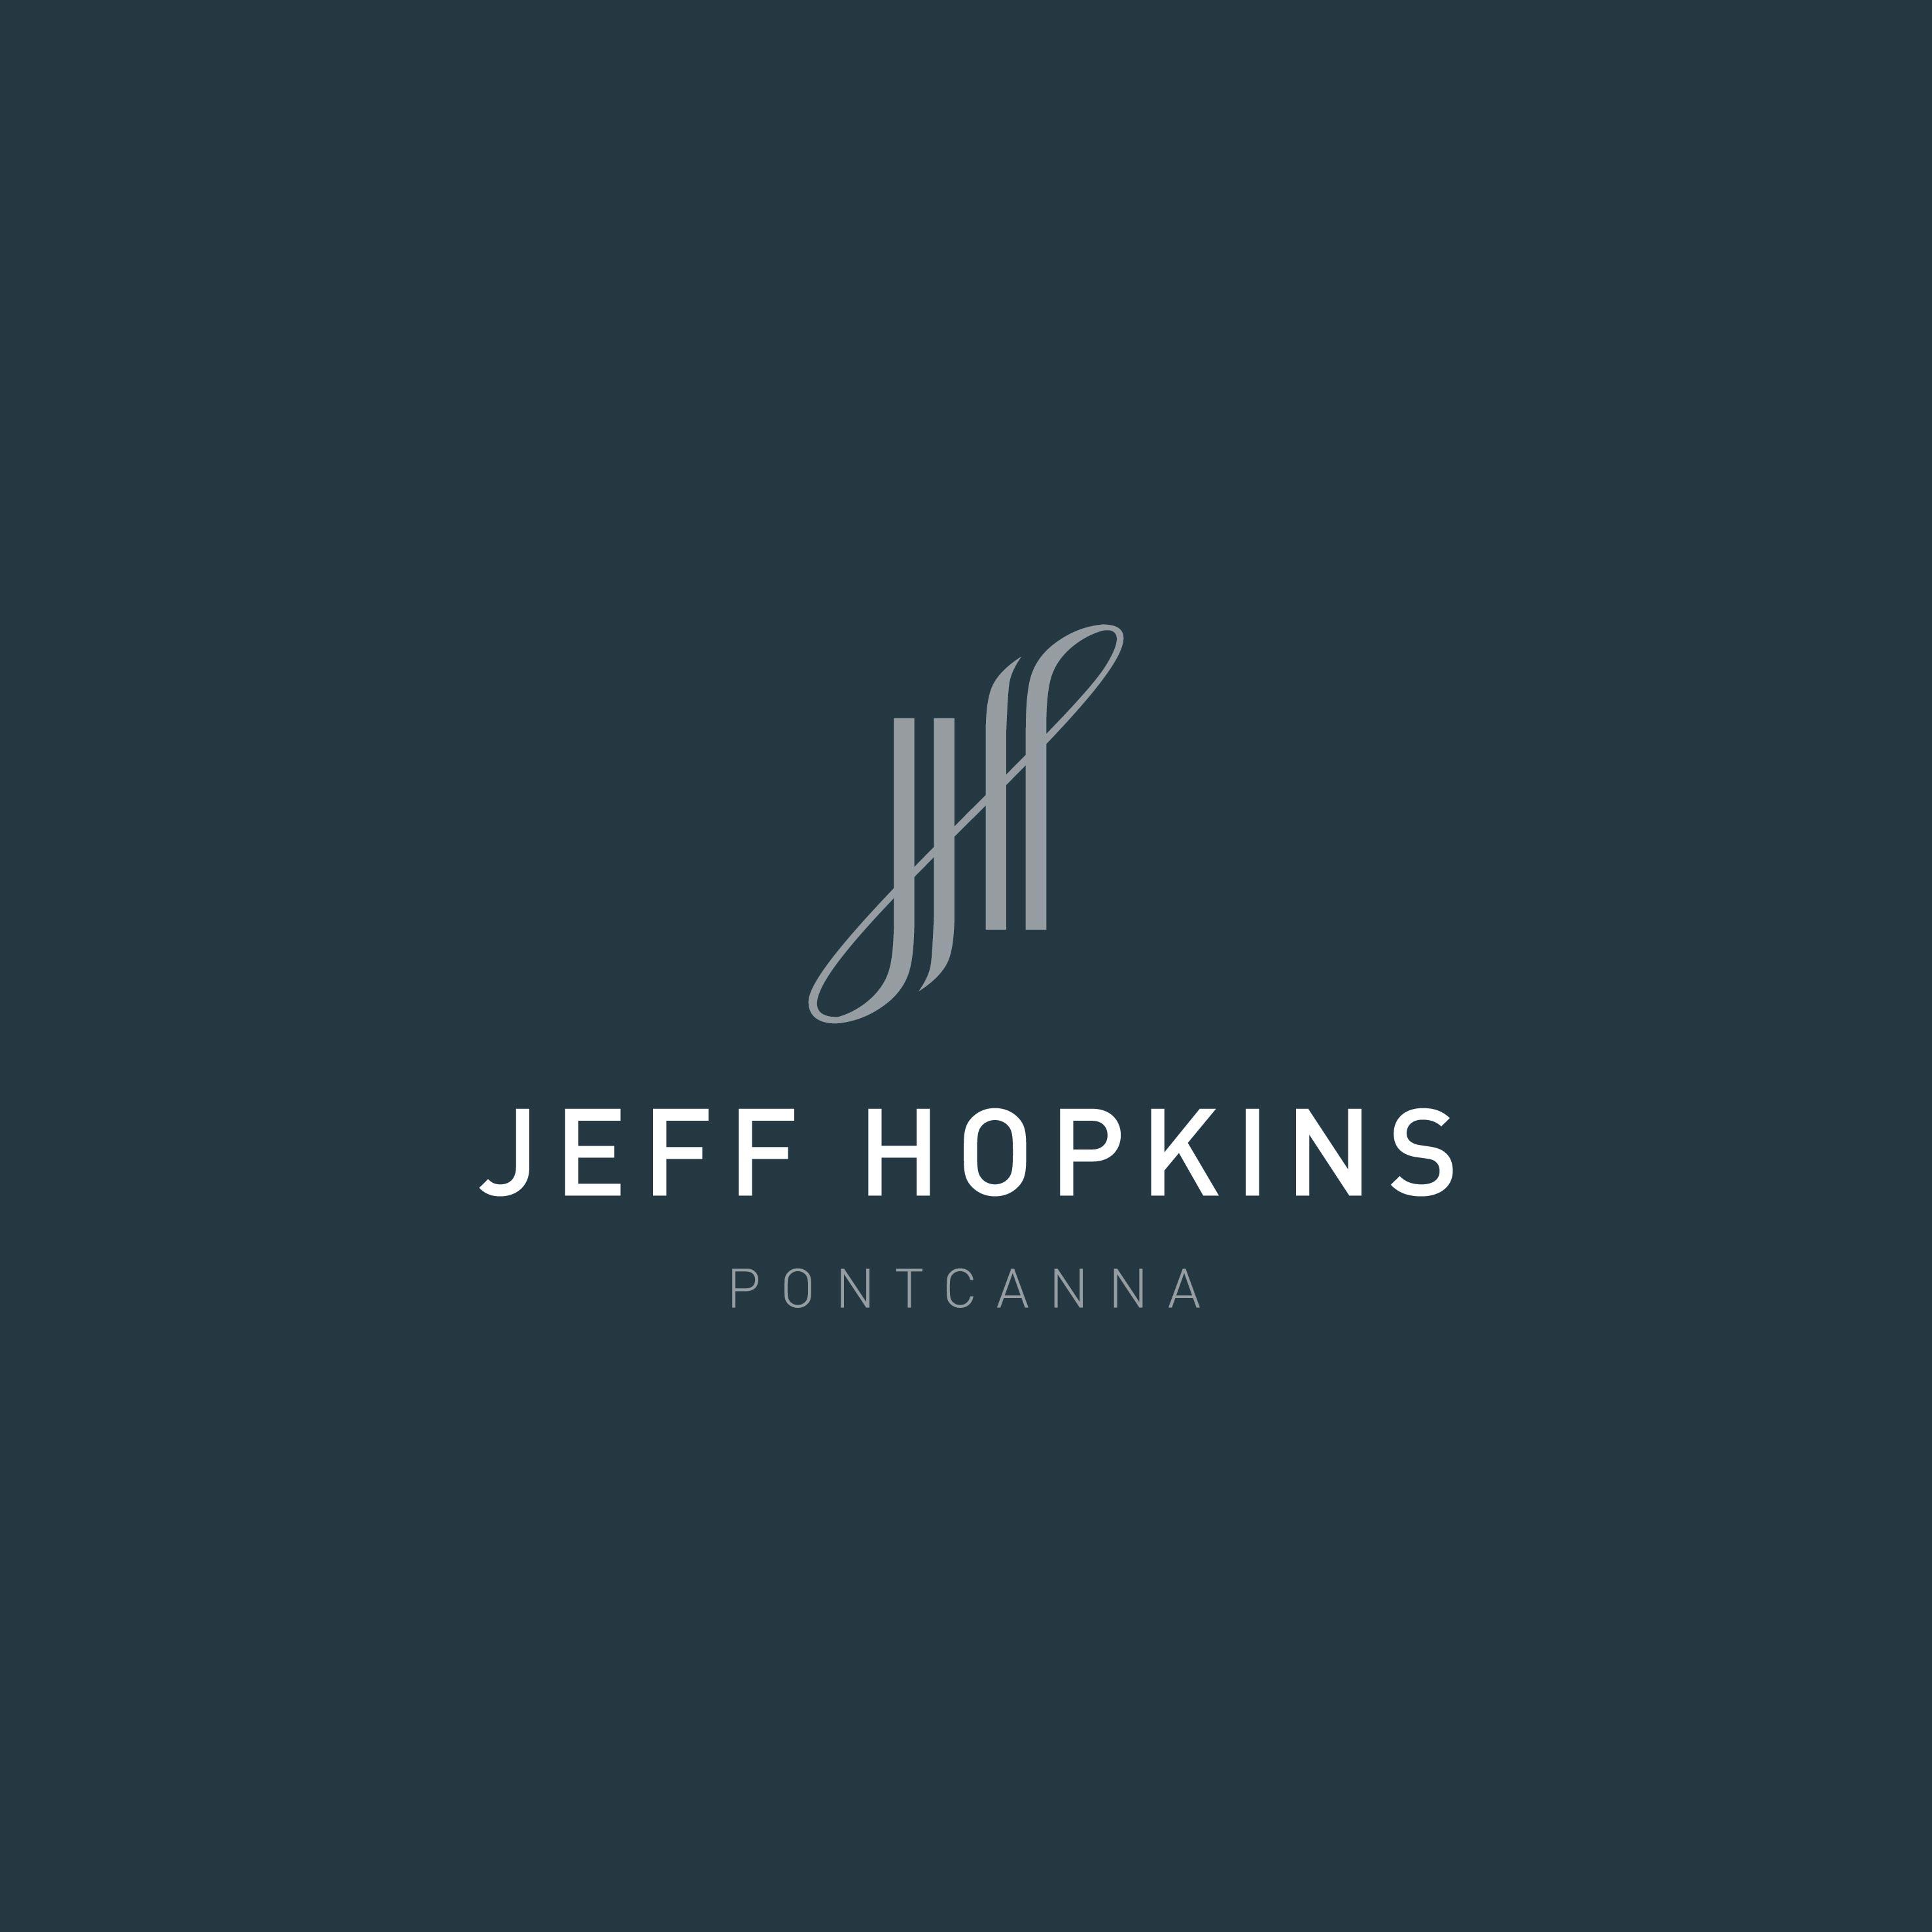 Jeff Hopkins Estate Agents